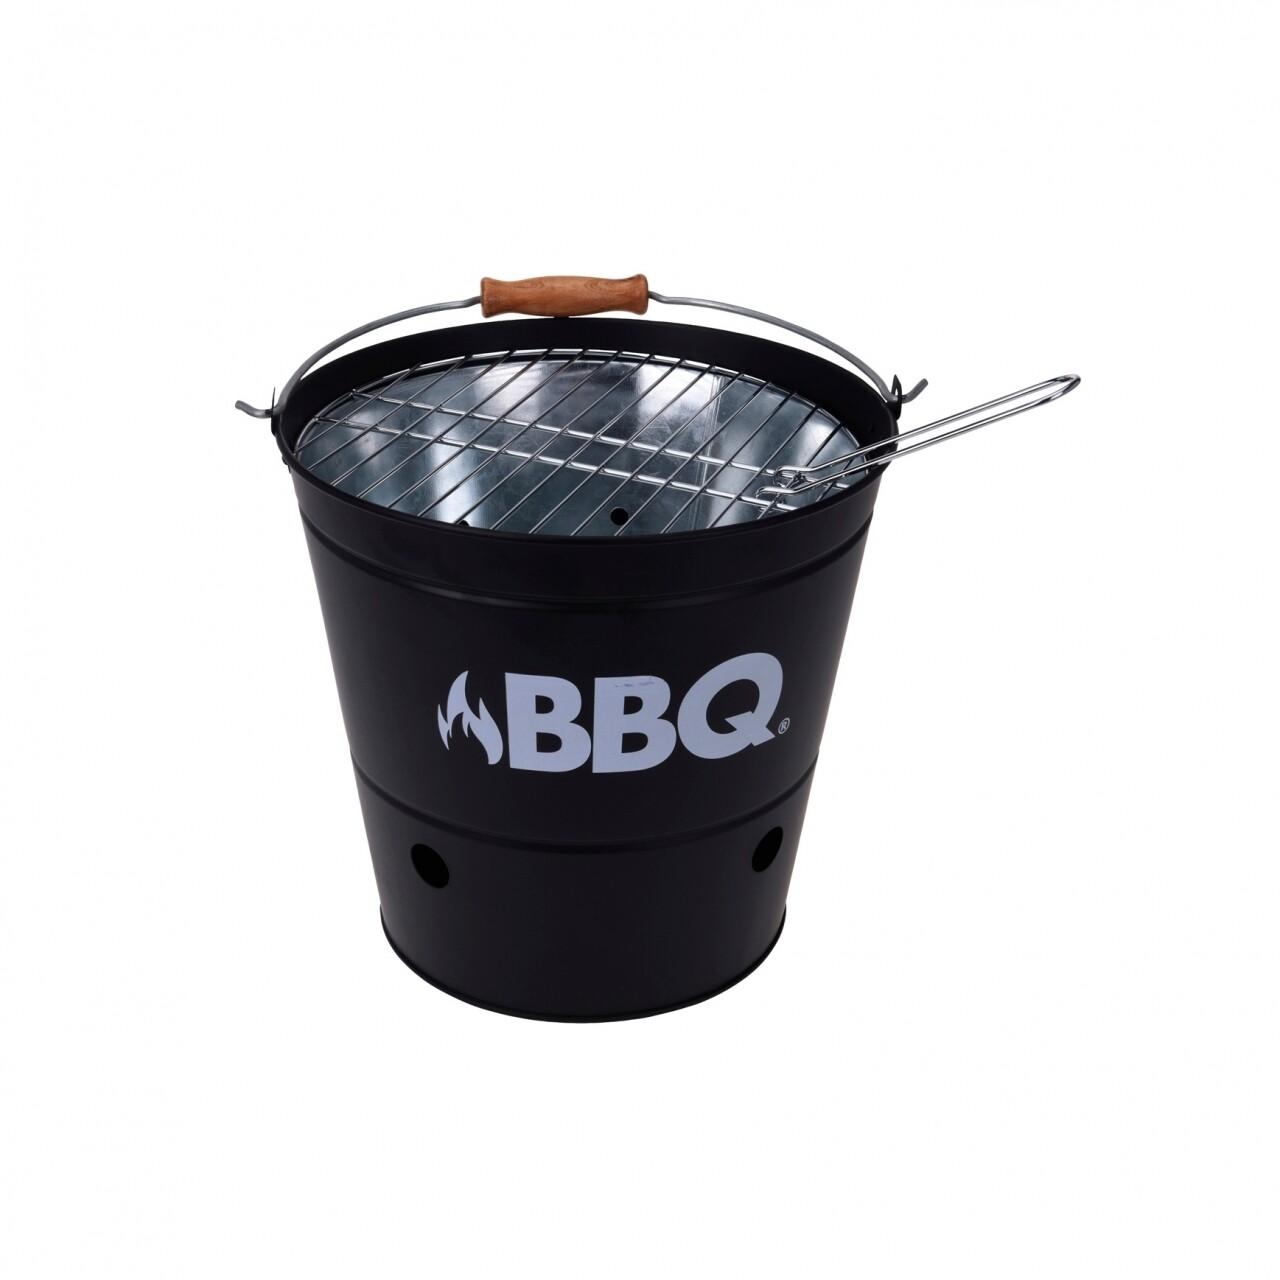 Gratar BBQ Black, 19 x 19 x 25 cm, metal, negru